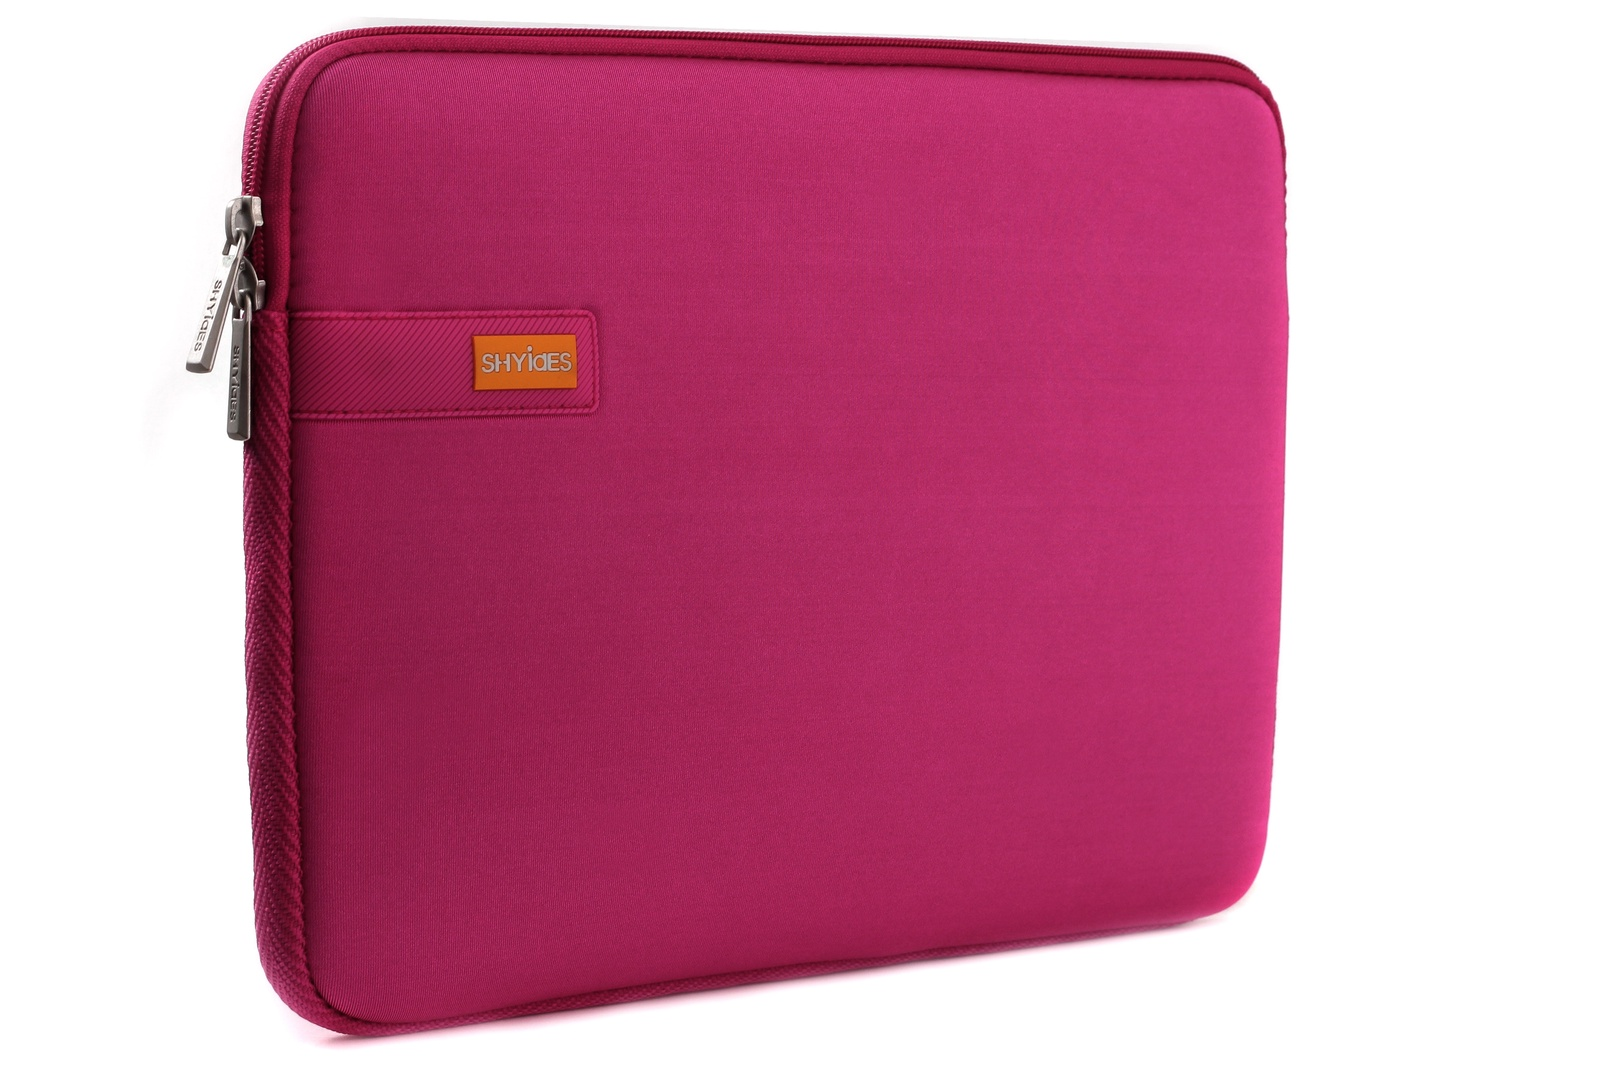 Чехол сумка SHYIDES для ноутбука 12, розовый